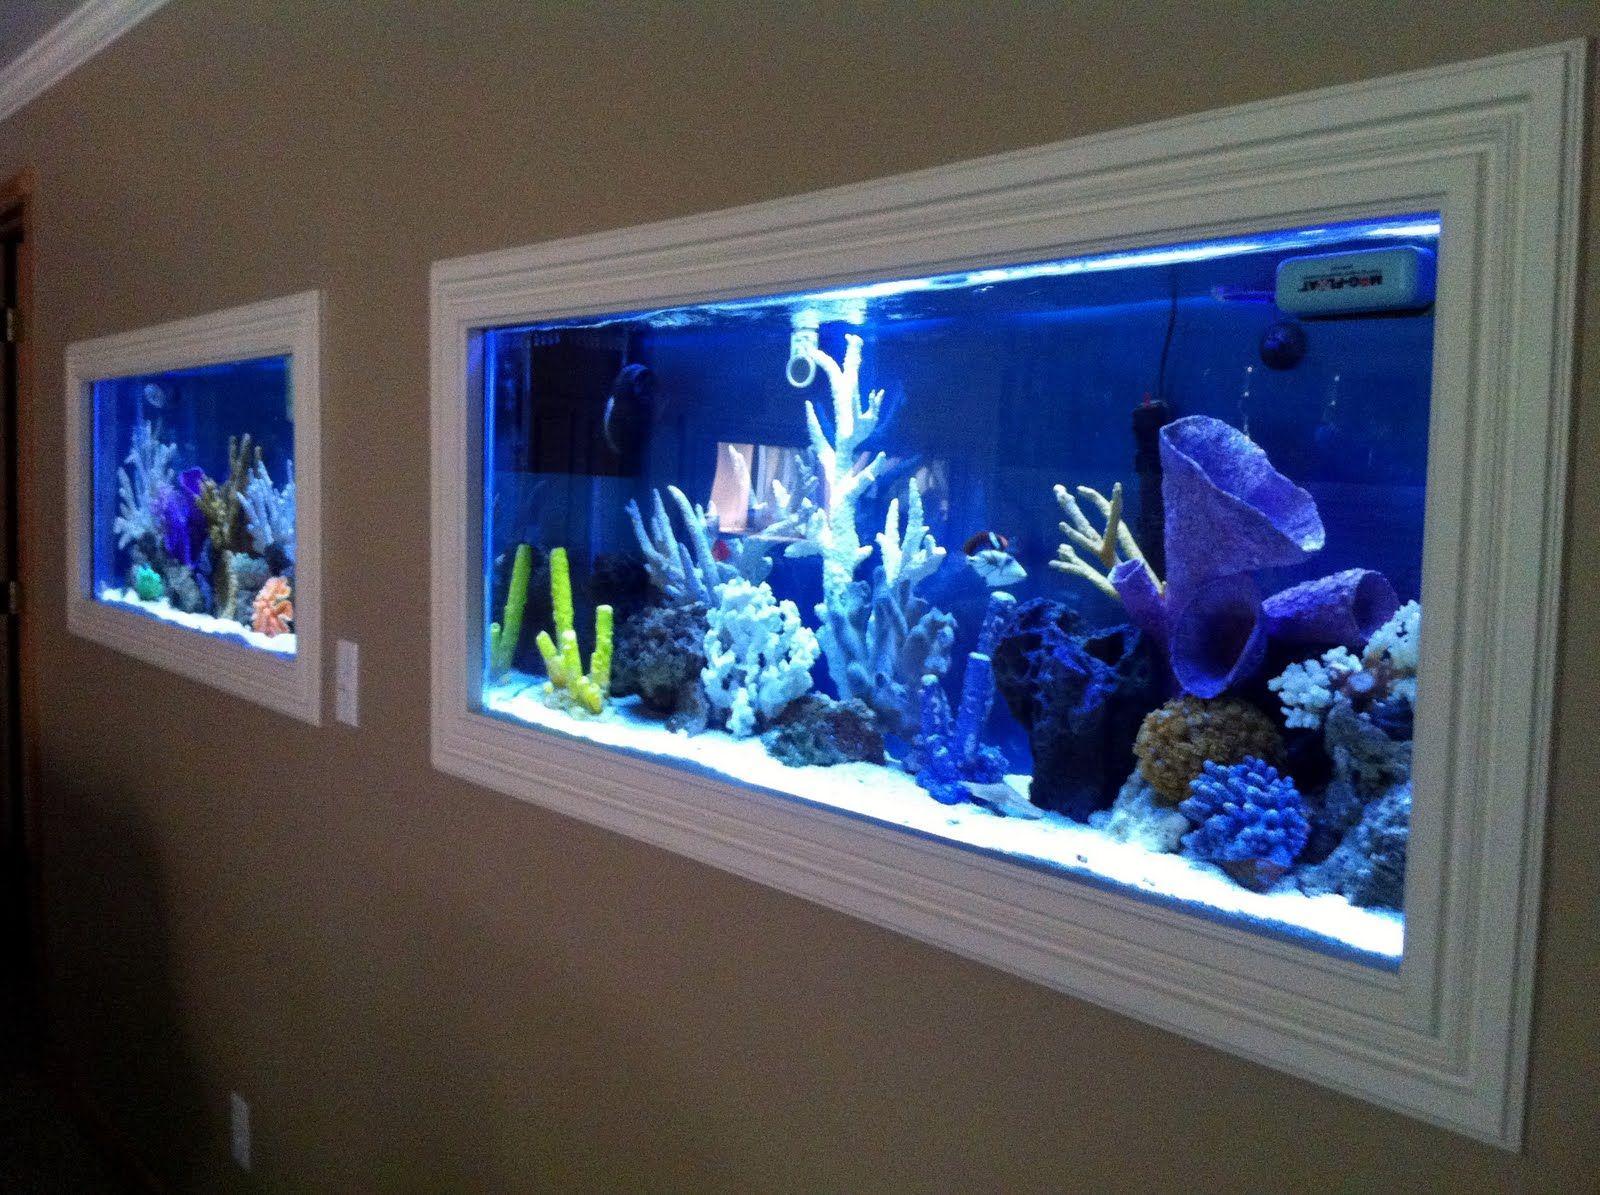 Furniture Fashion Presents 50 In Wall Aquariums